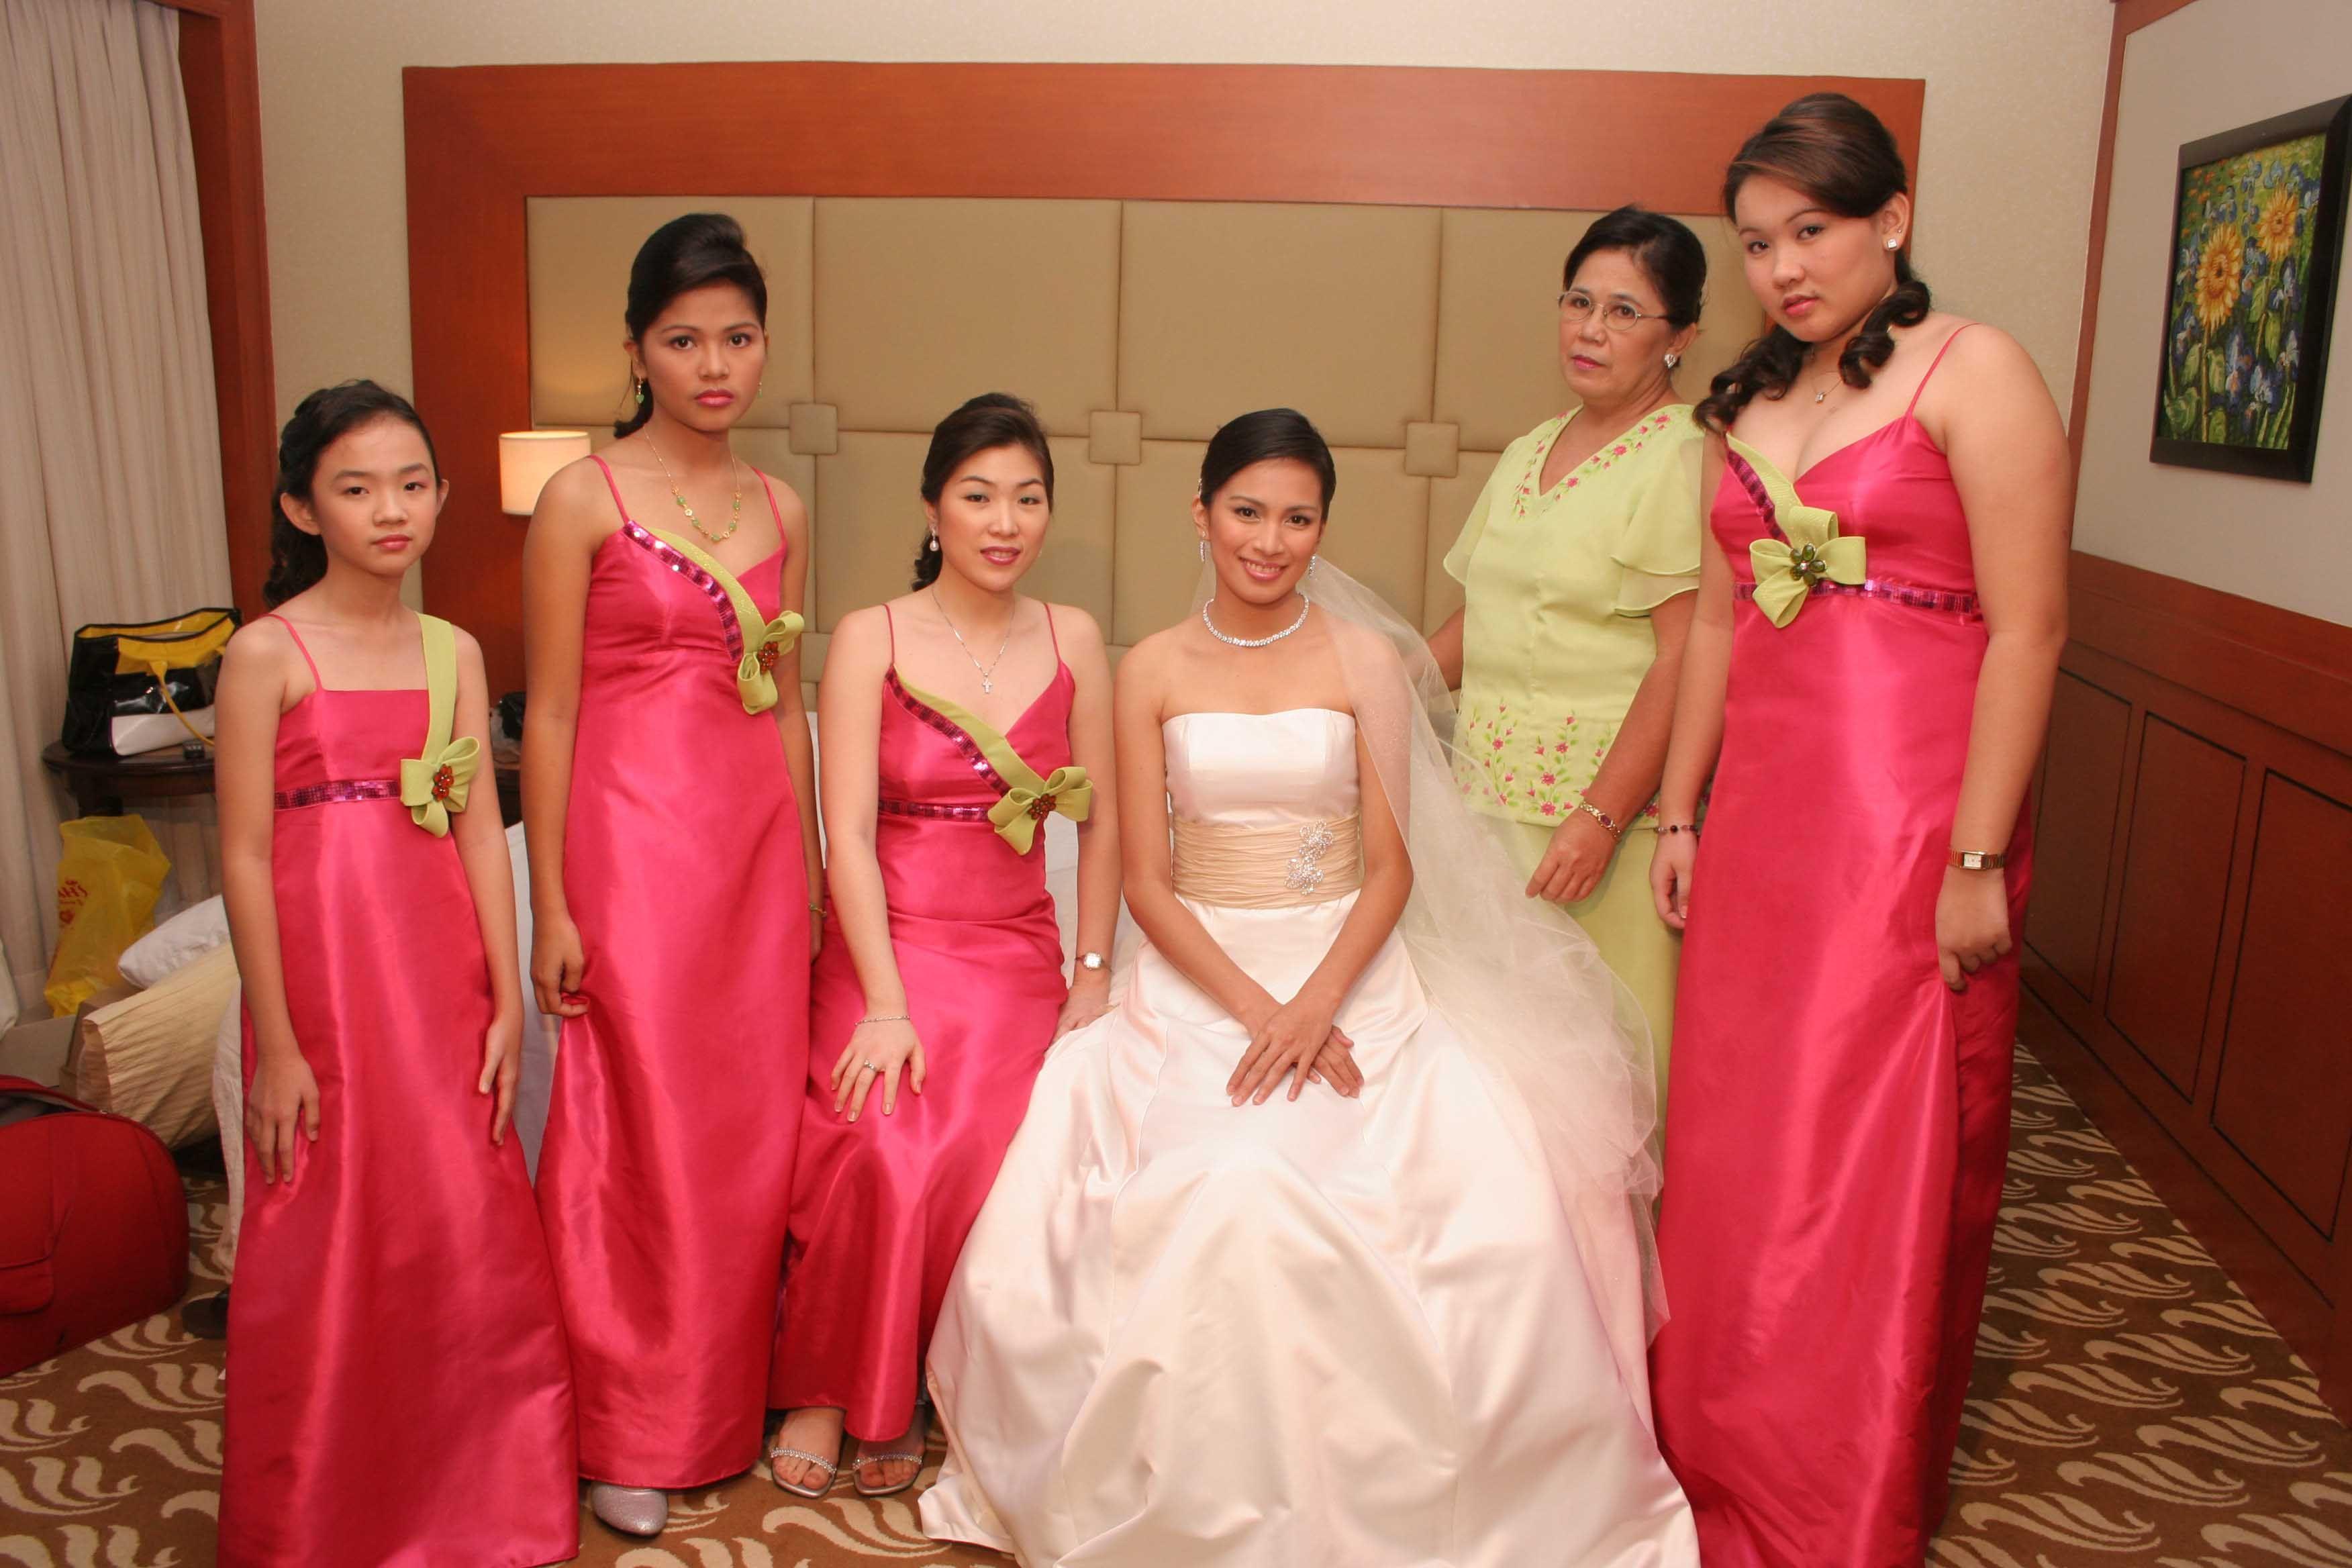 Pin by My Wedding Journey on Wedding Entourage | Pinterest ...